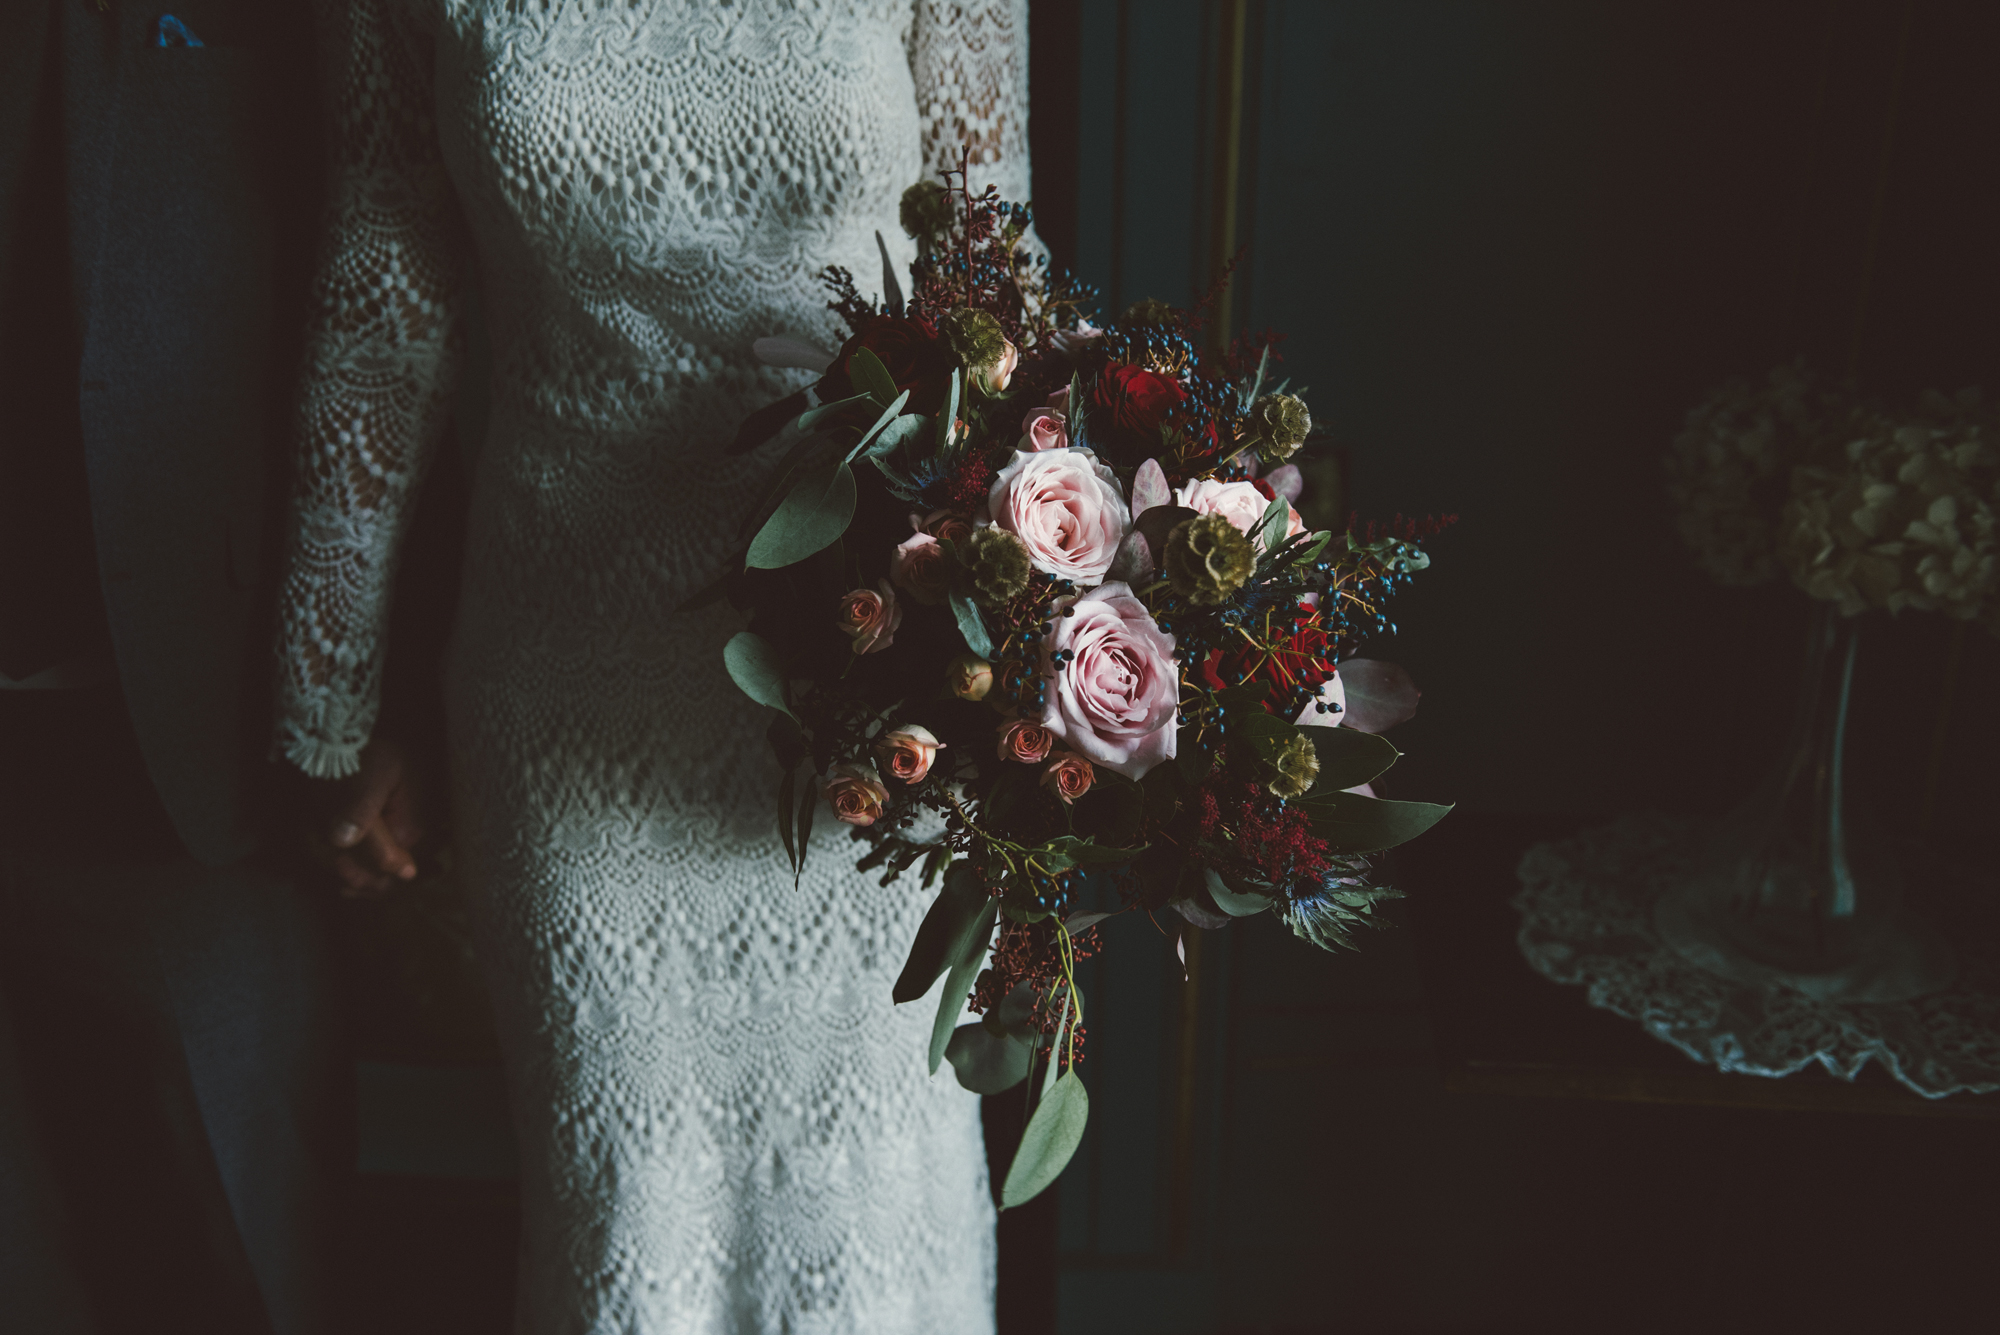 wedding_flowers_bouquet_style_northern_ireland_florist_inspire-weddings.jpg